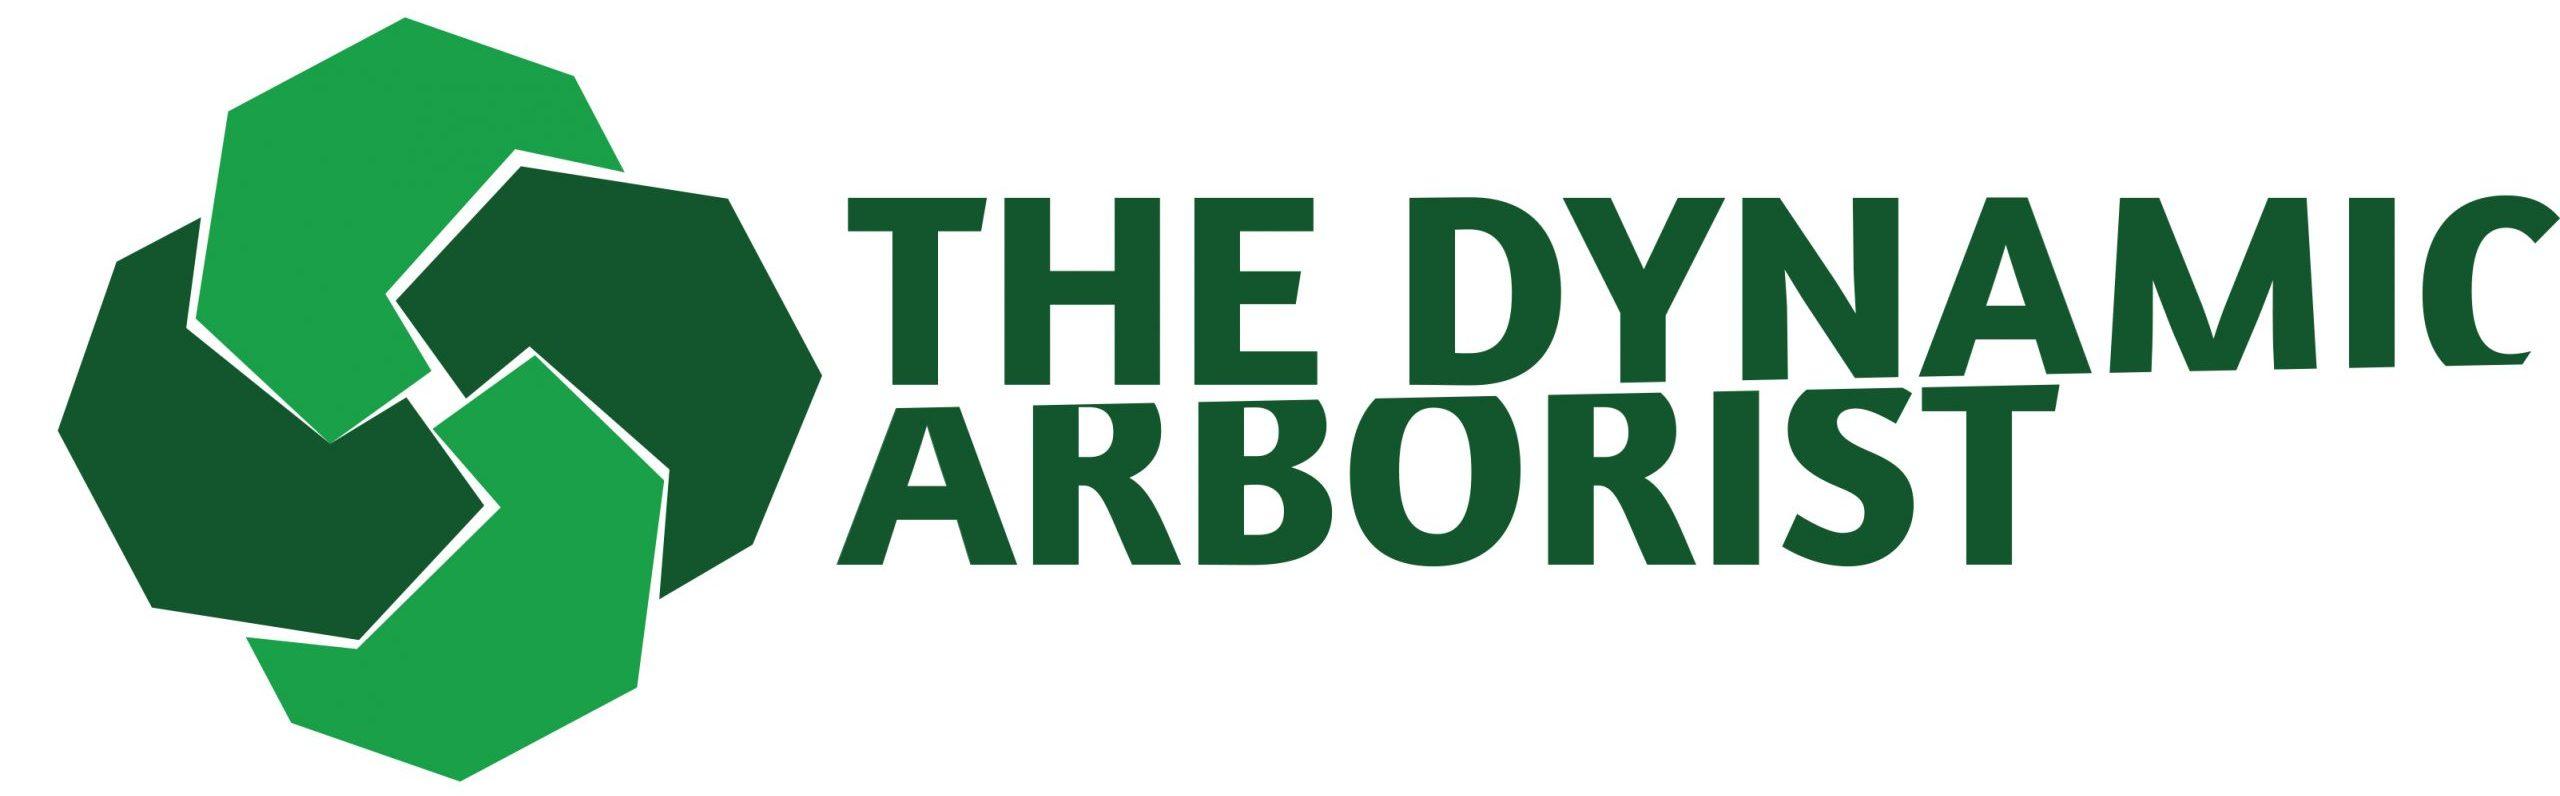 Dynamic Arborist